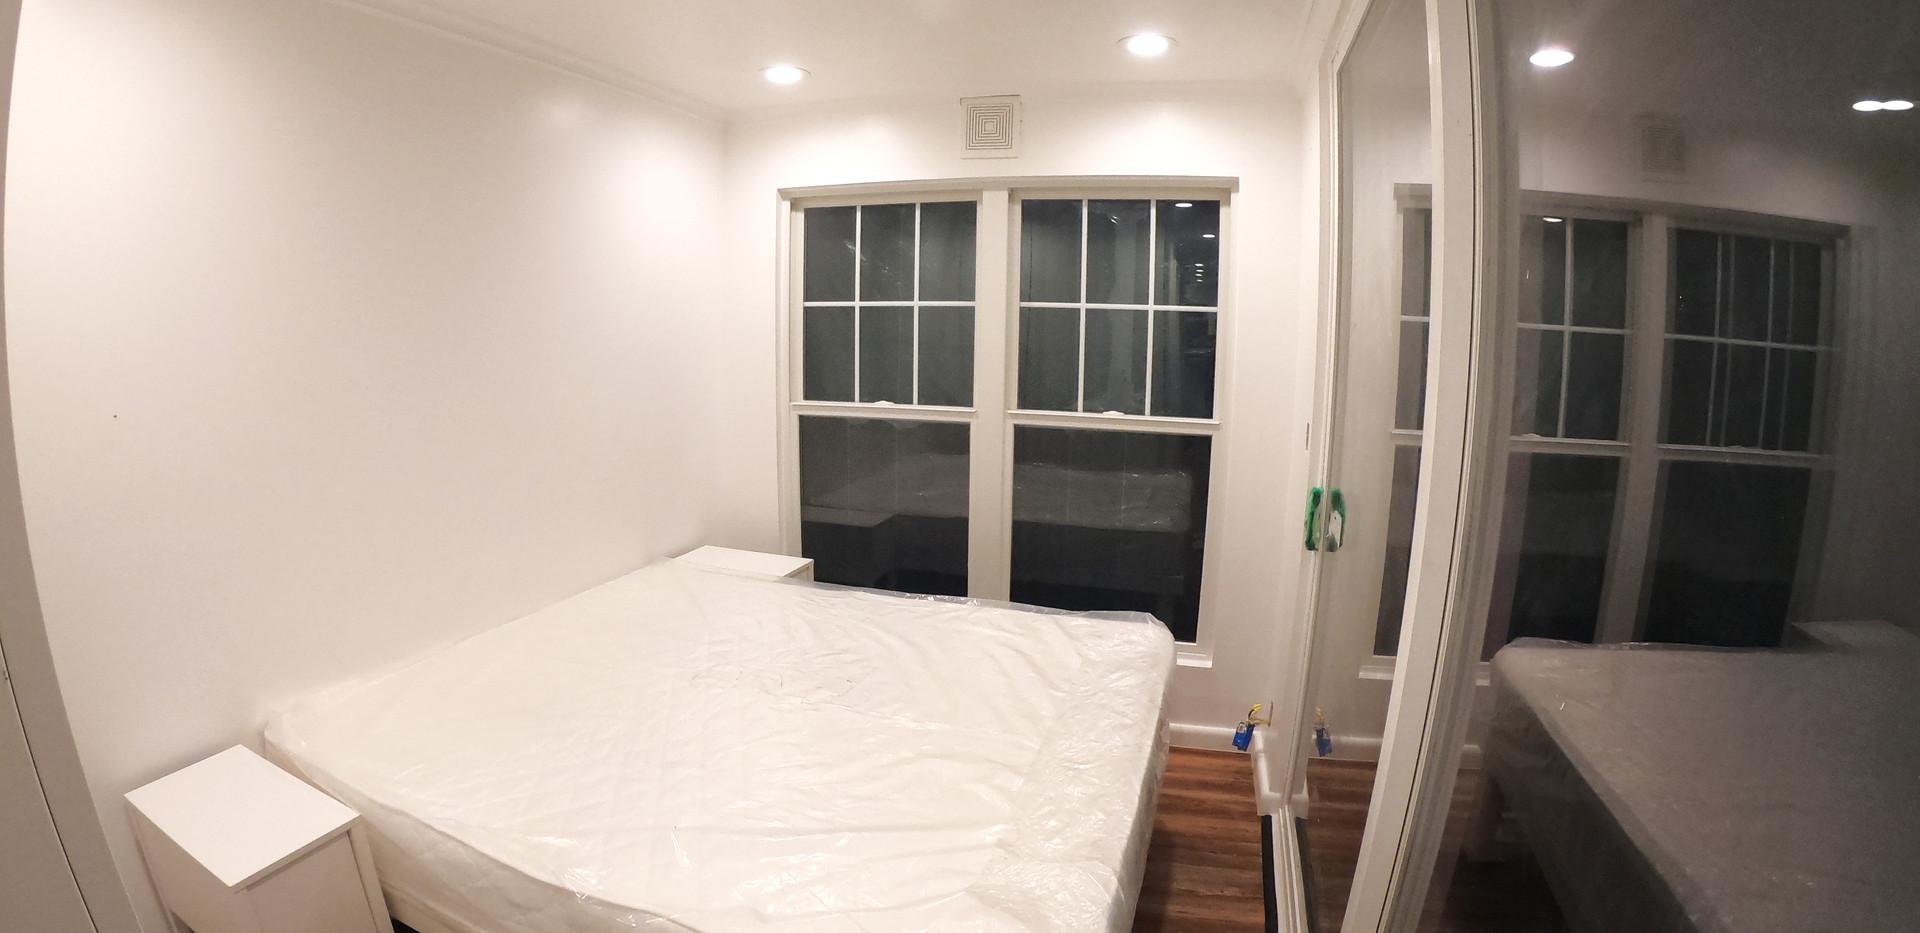 Interior-Bedroom-CustomBed.jpg